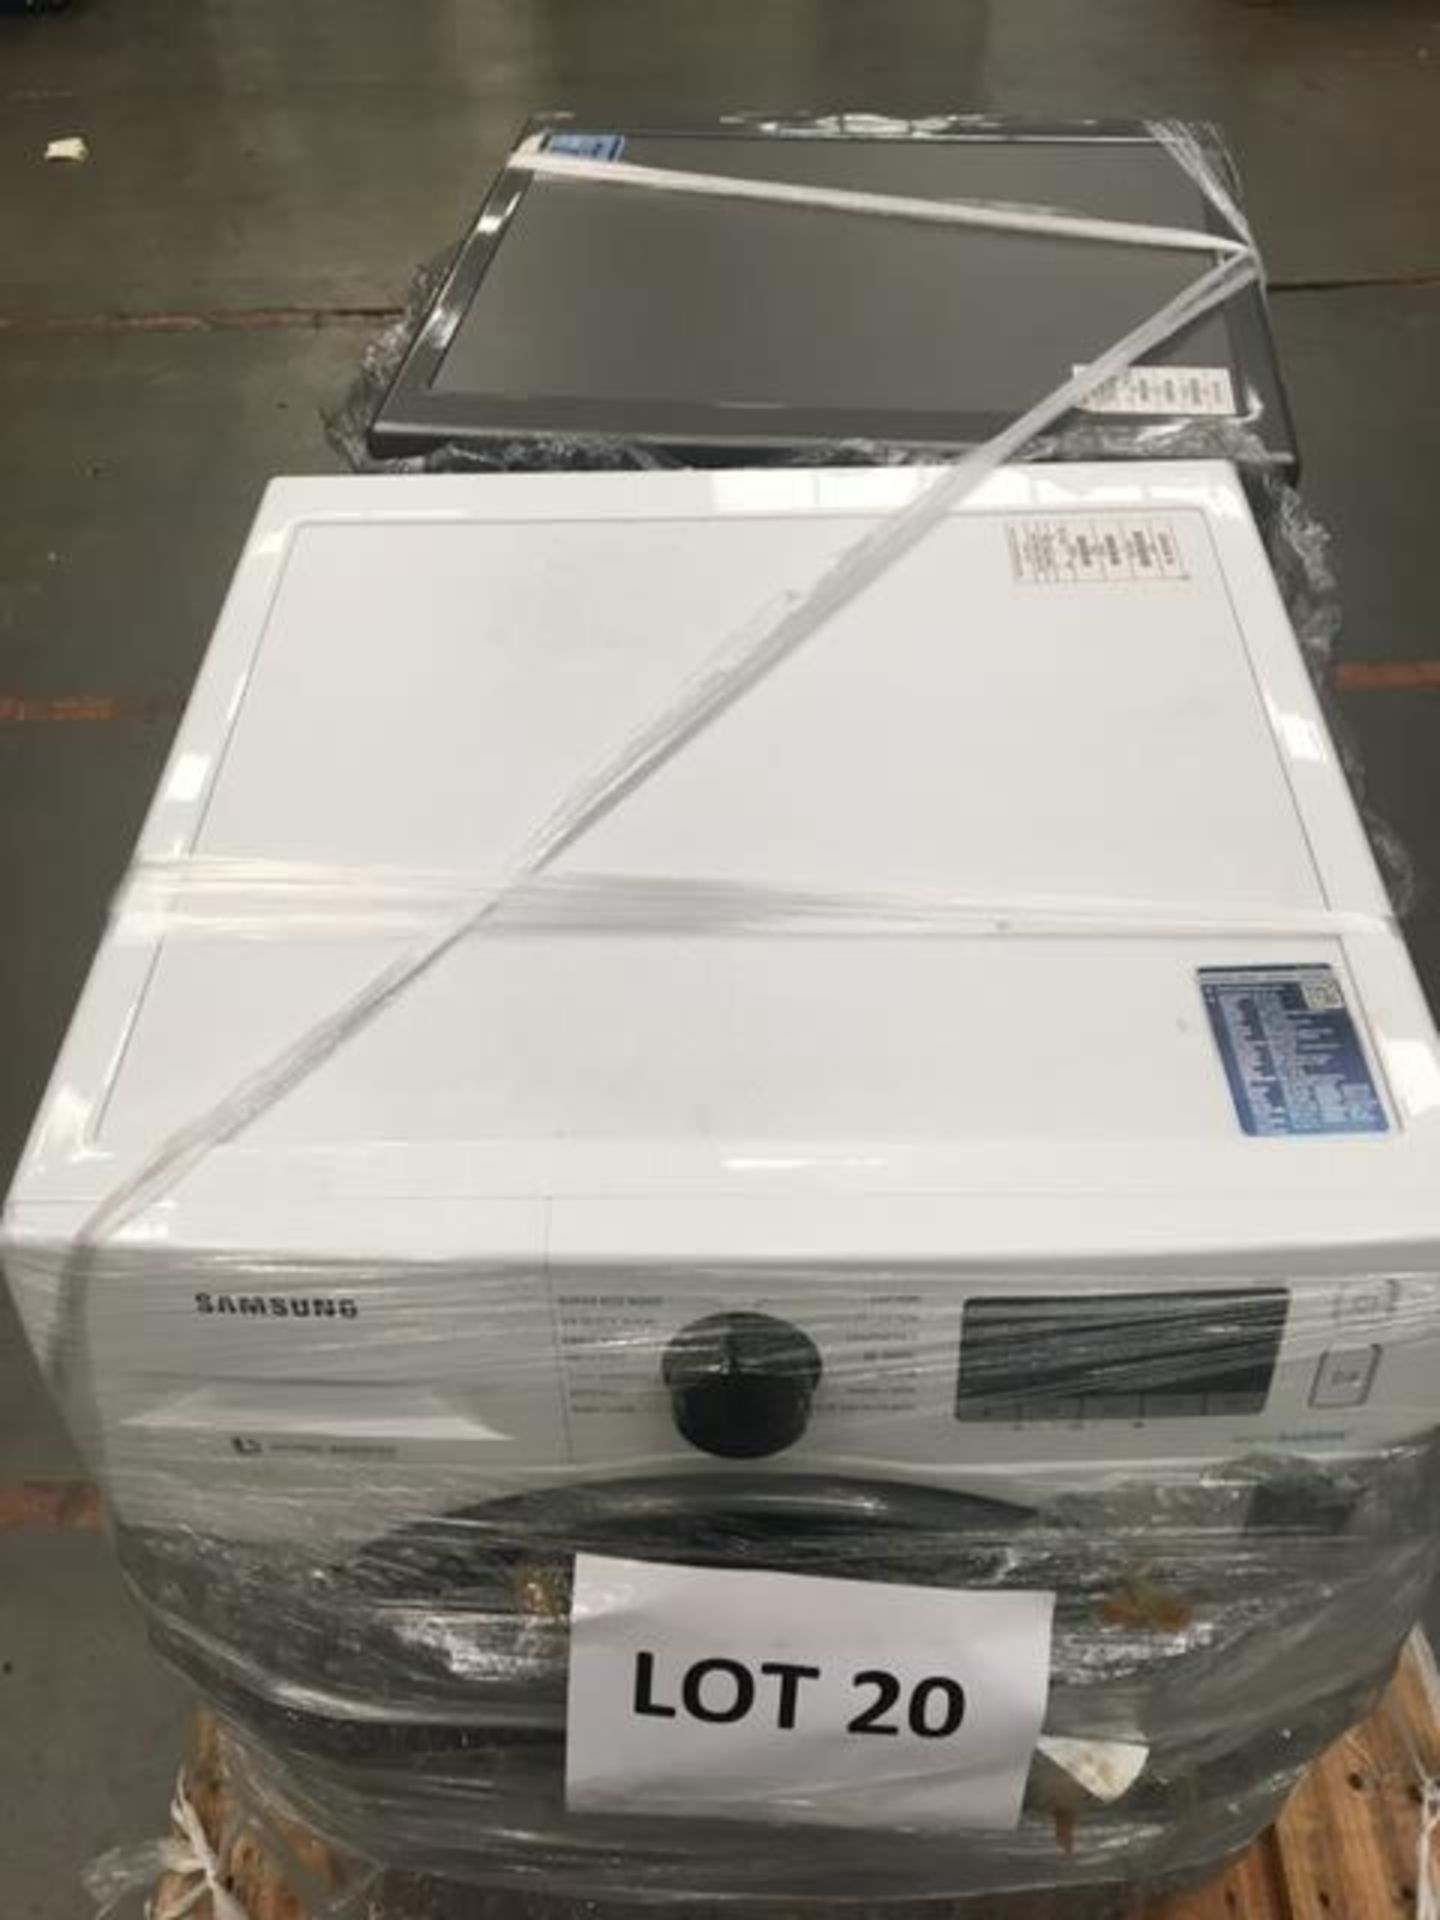 Pallet of 2 Samsung Premium Washing machines. Latest selling price £738 - Image 6 of 8